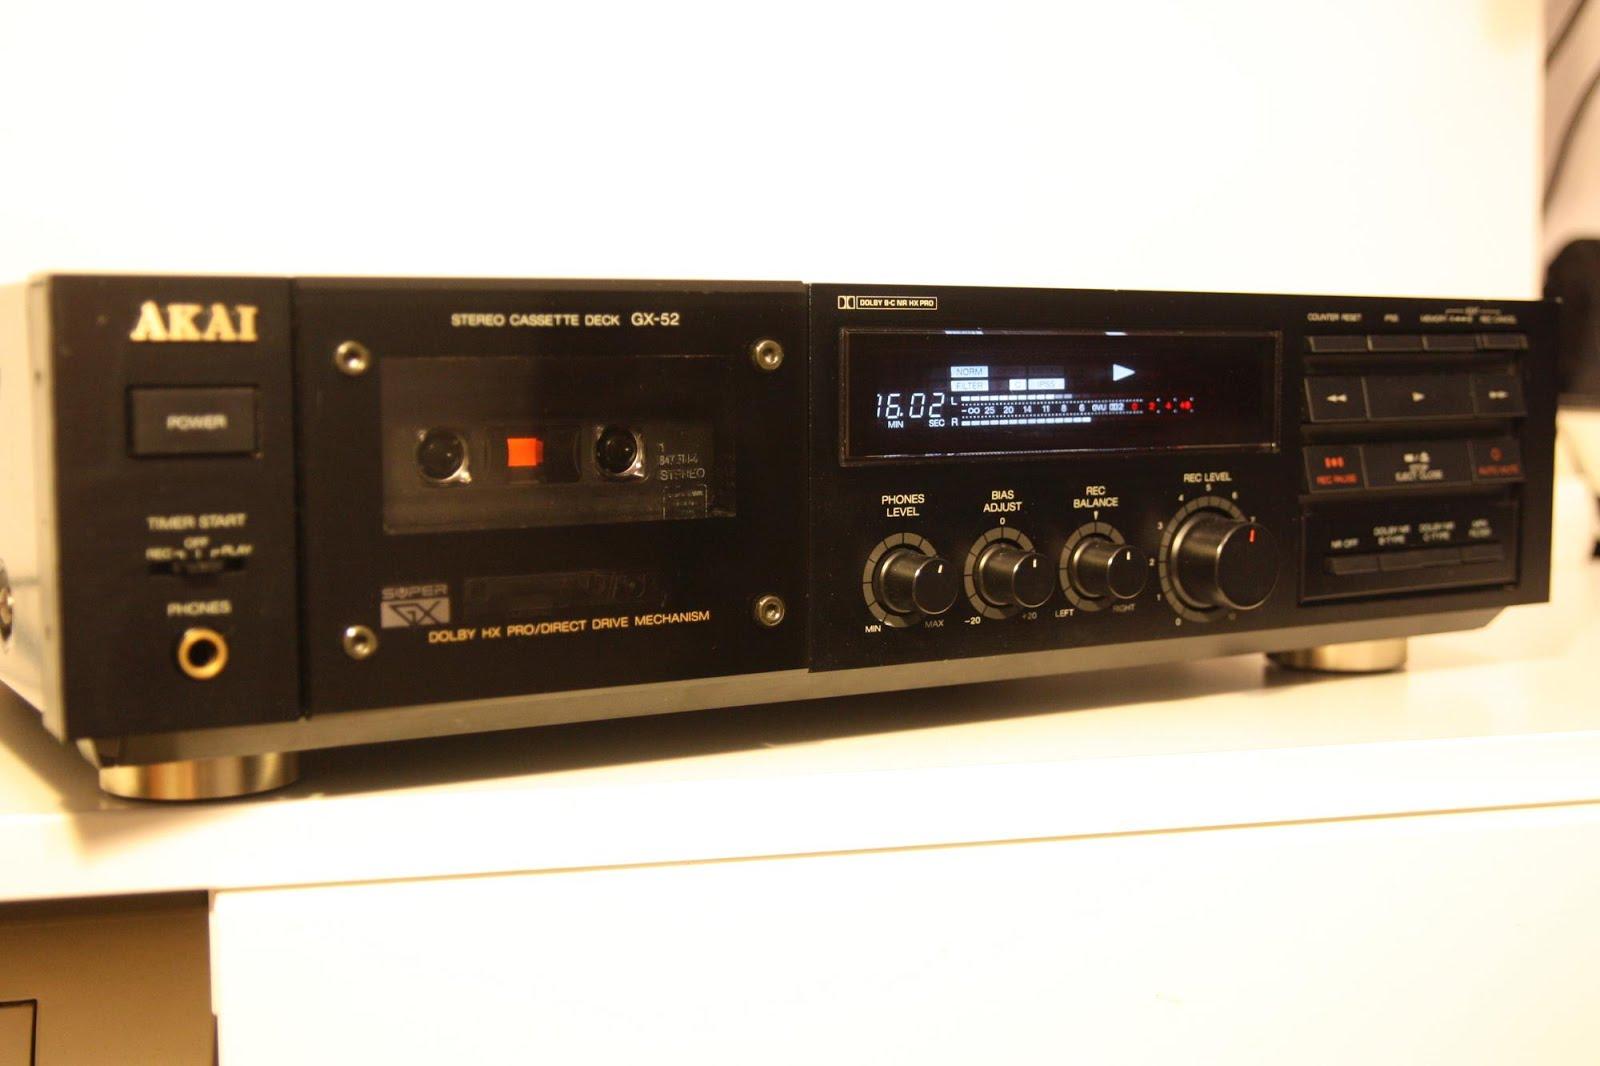 Akai Gx 52 Stereo Cassette Deck Audiobaza